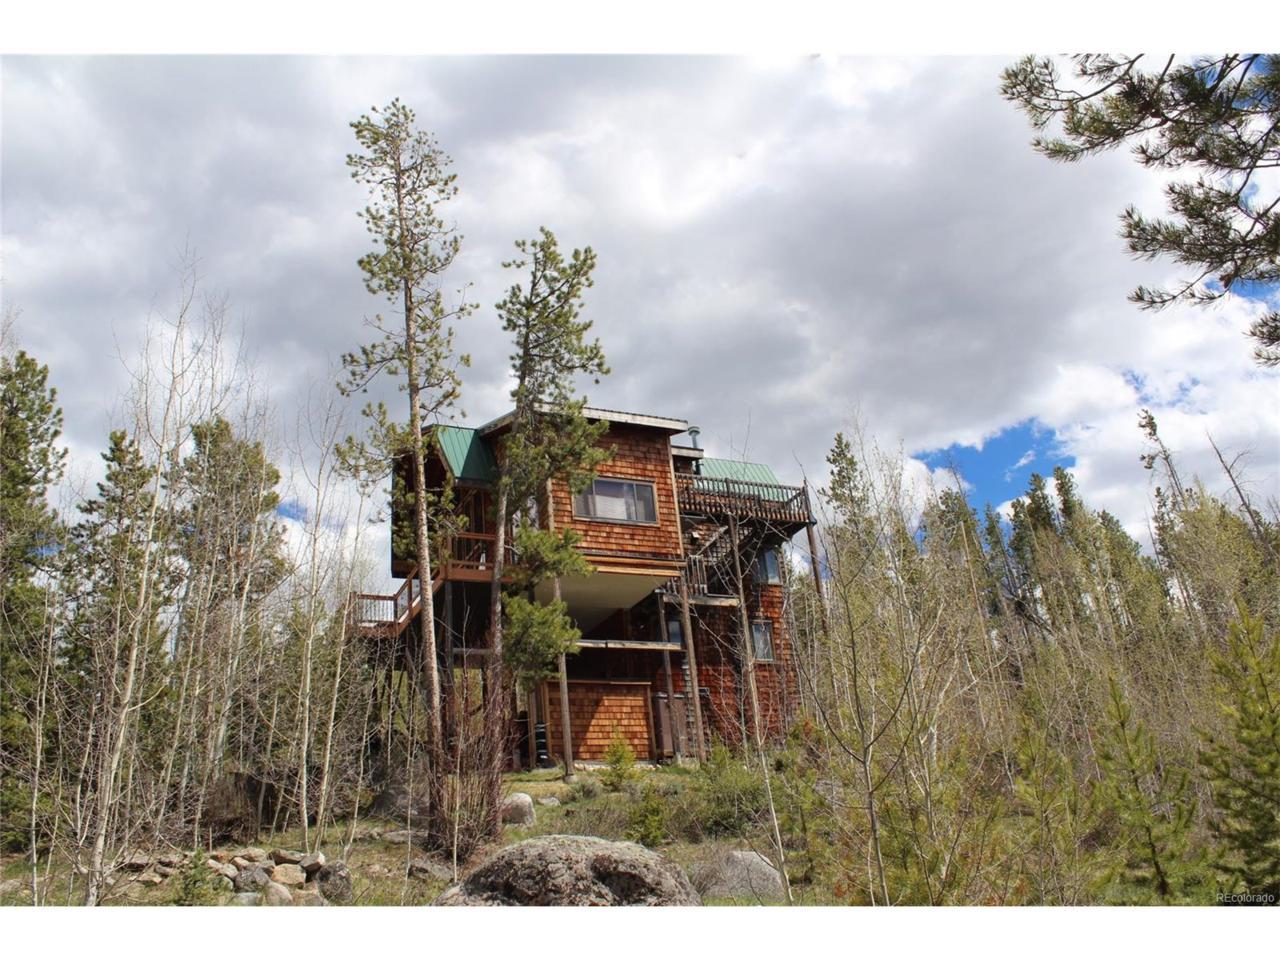 19 County Road 6341, Granby, CO 80446 (MLS #8102128) :: 8z Real Estate